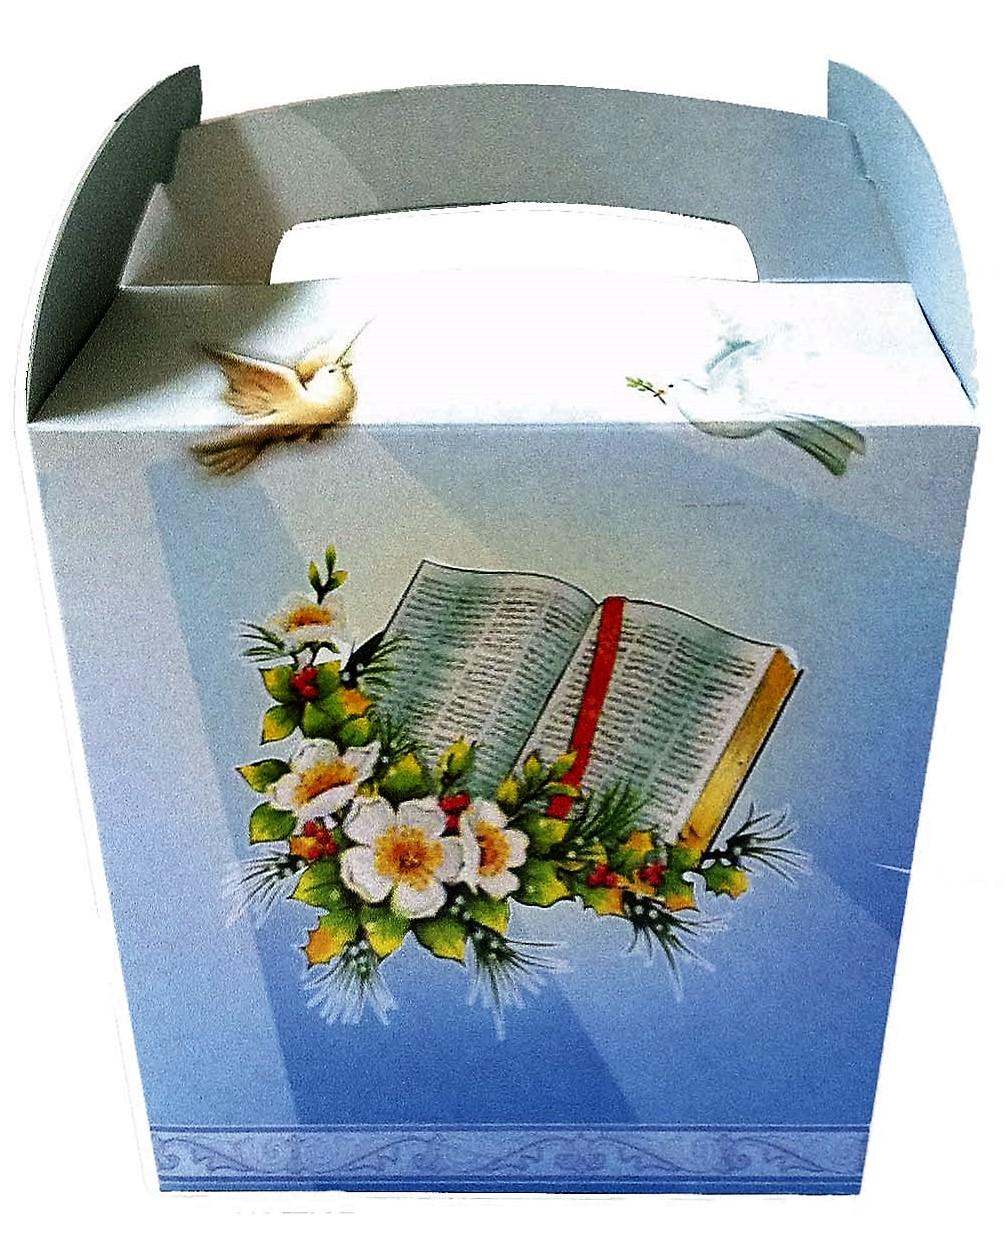 40010 Caja Baul Comunión Libro Image